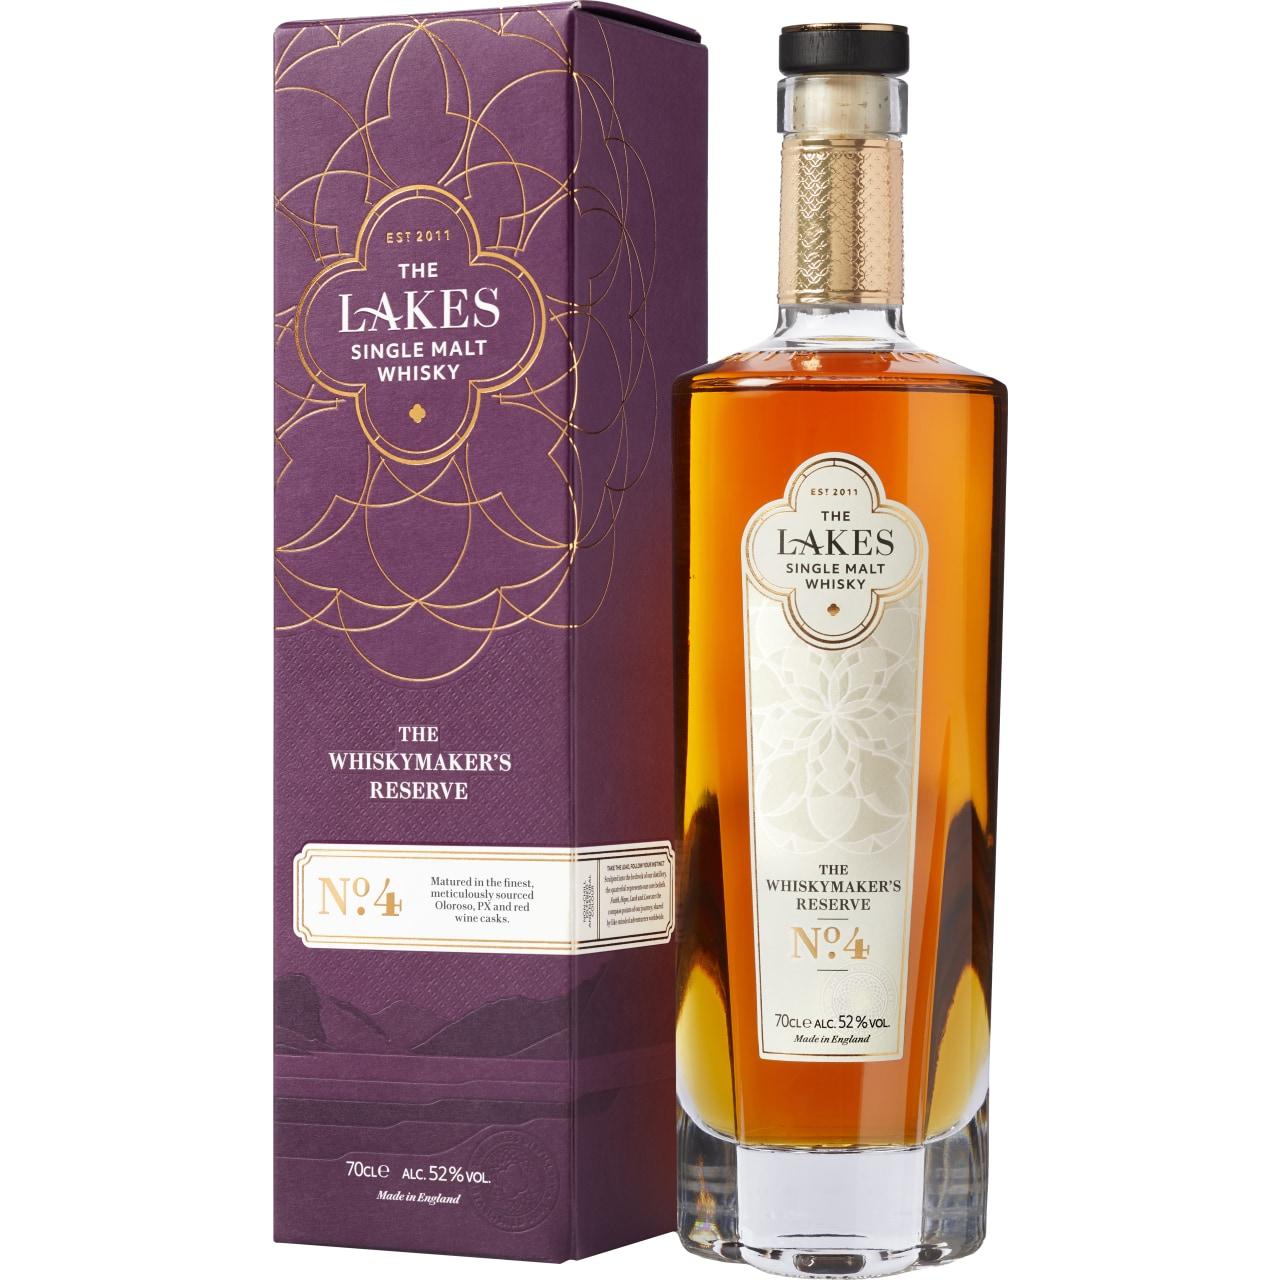 The Lakes Single Malt Whiskymaker's Reserve No. 4